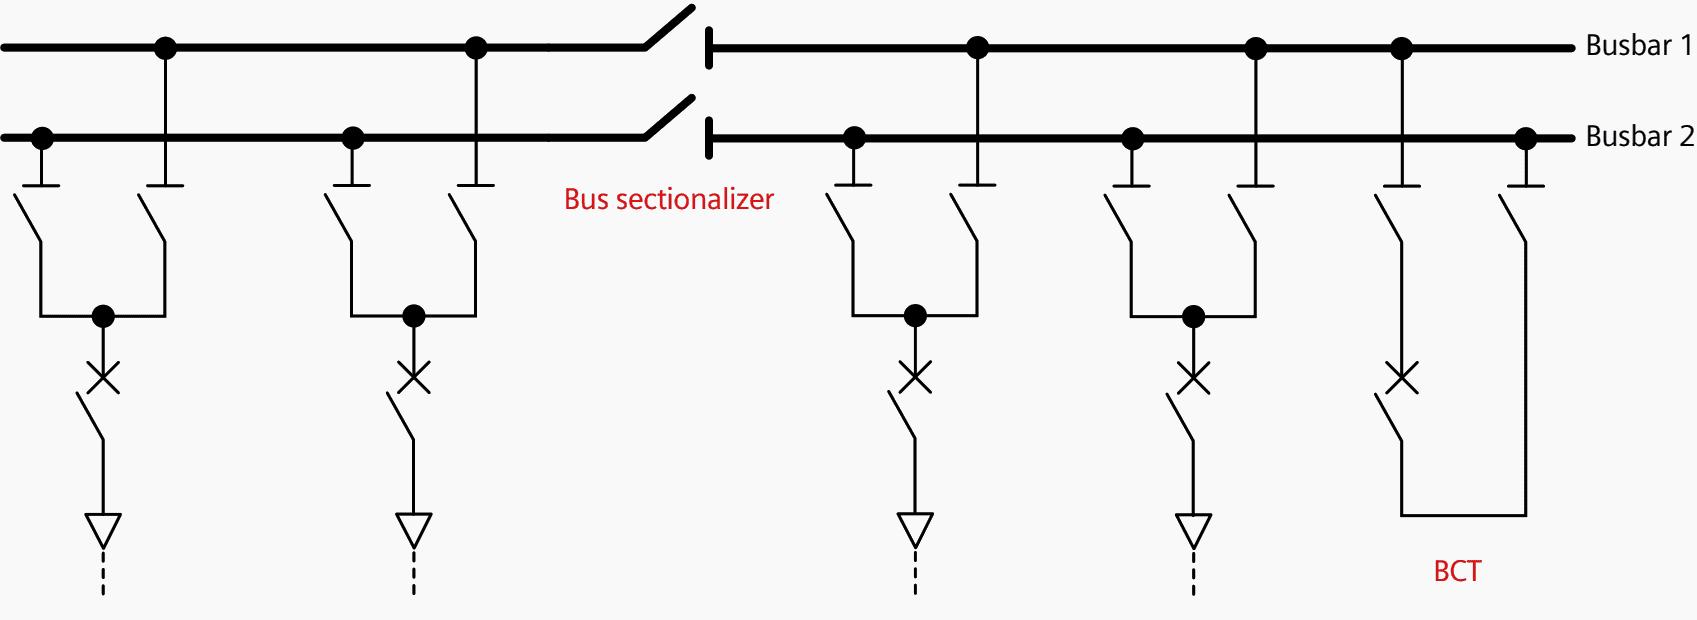 Duplicate busbar with bus sectionalizer and busbar coupler, transversal (BCT)